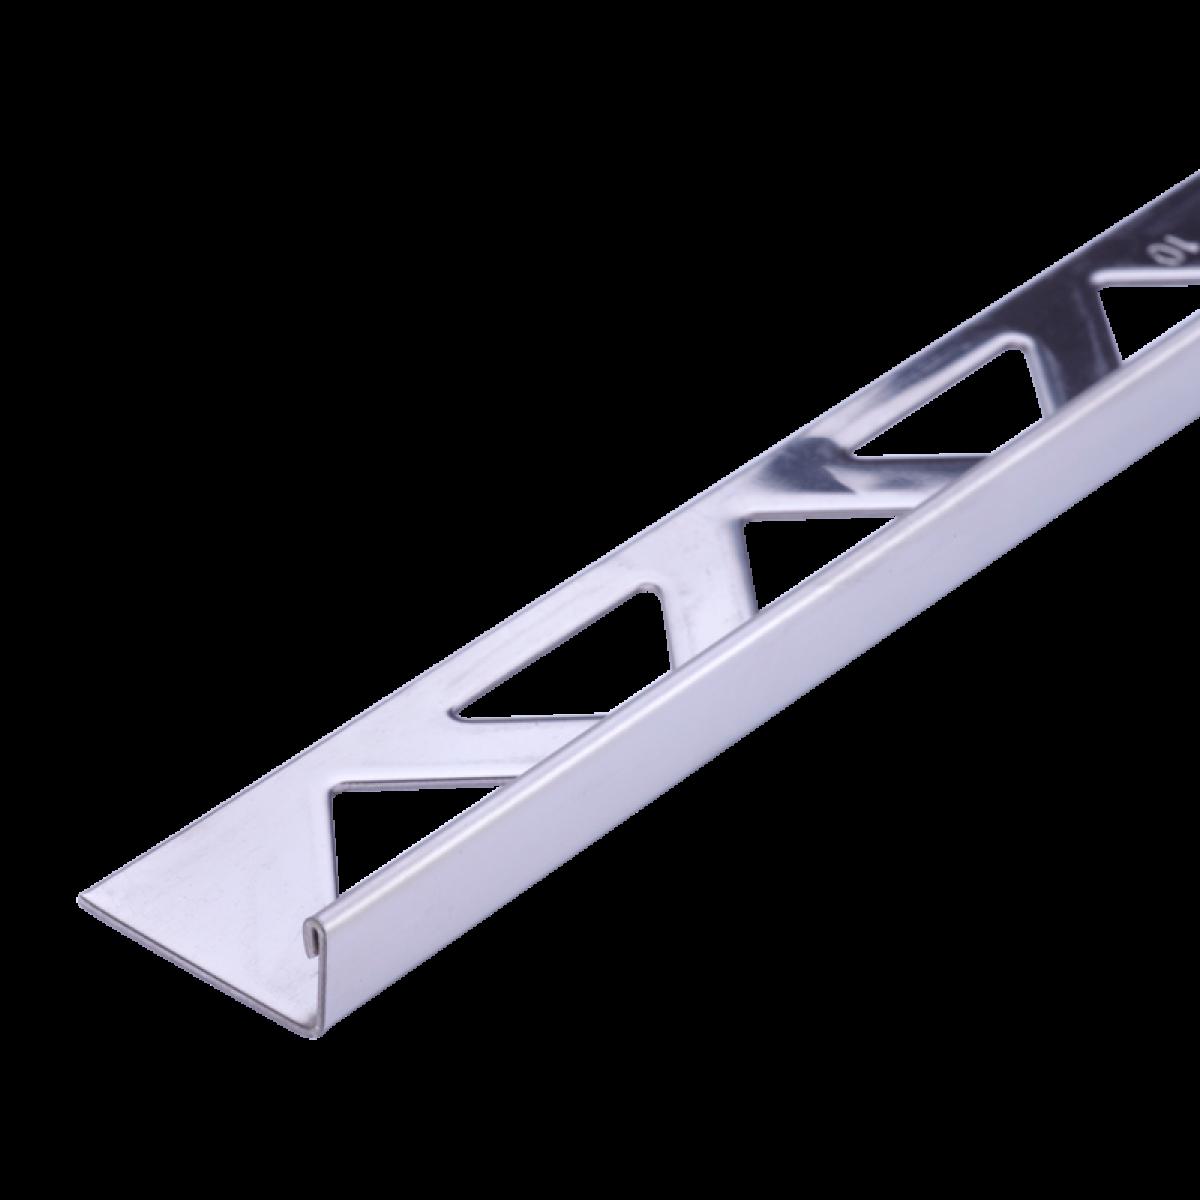 Edelstahl-Fliesenschiene FE 150 à 2,50 m